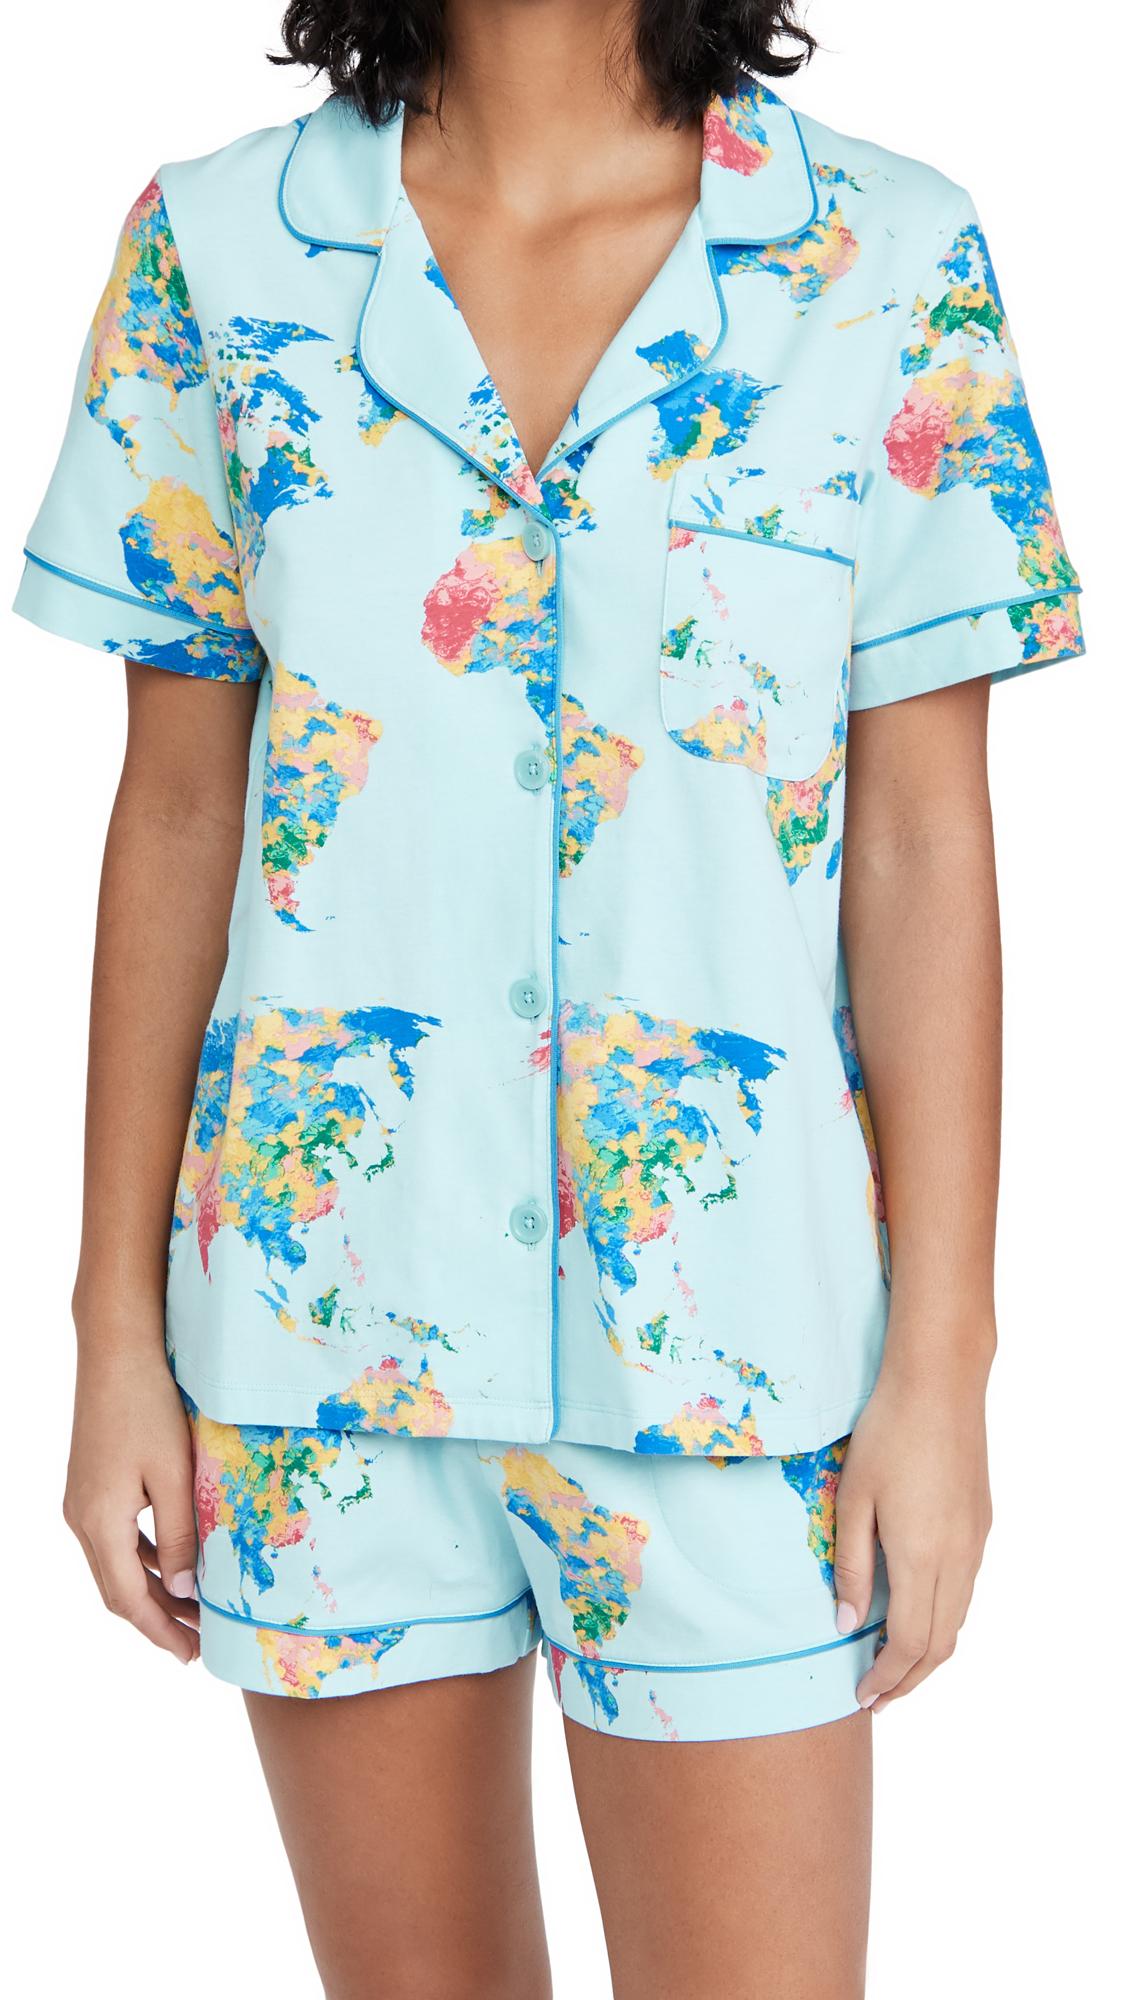 BedHead Pajamas World of Color Classic Shorty PJ Set